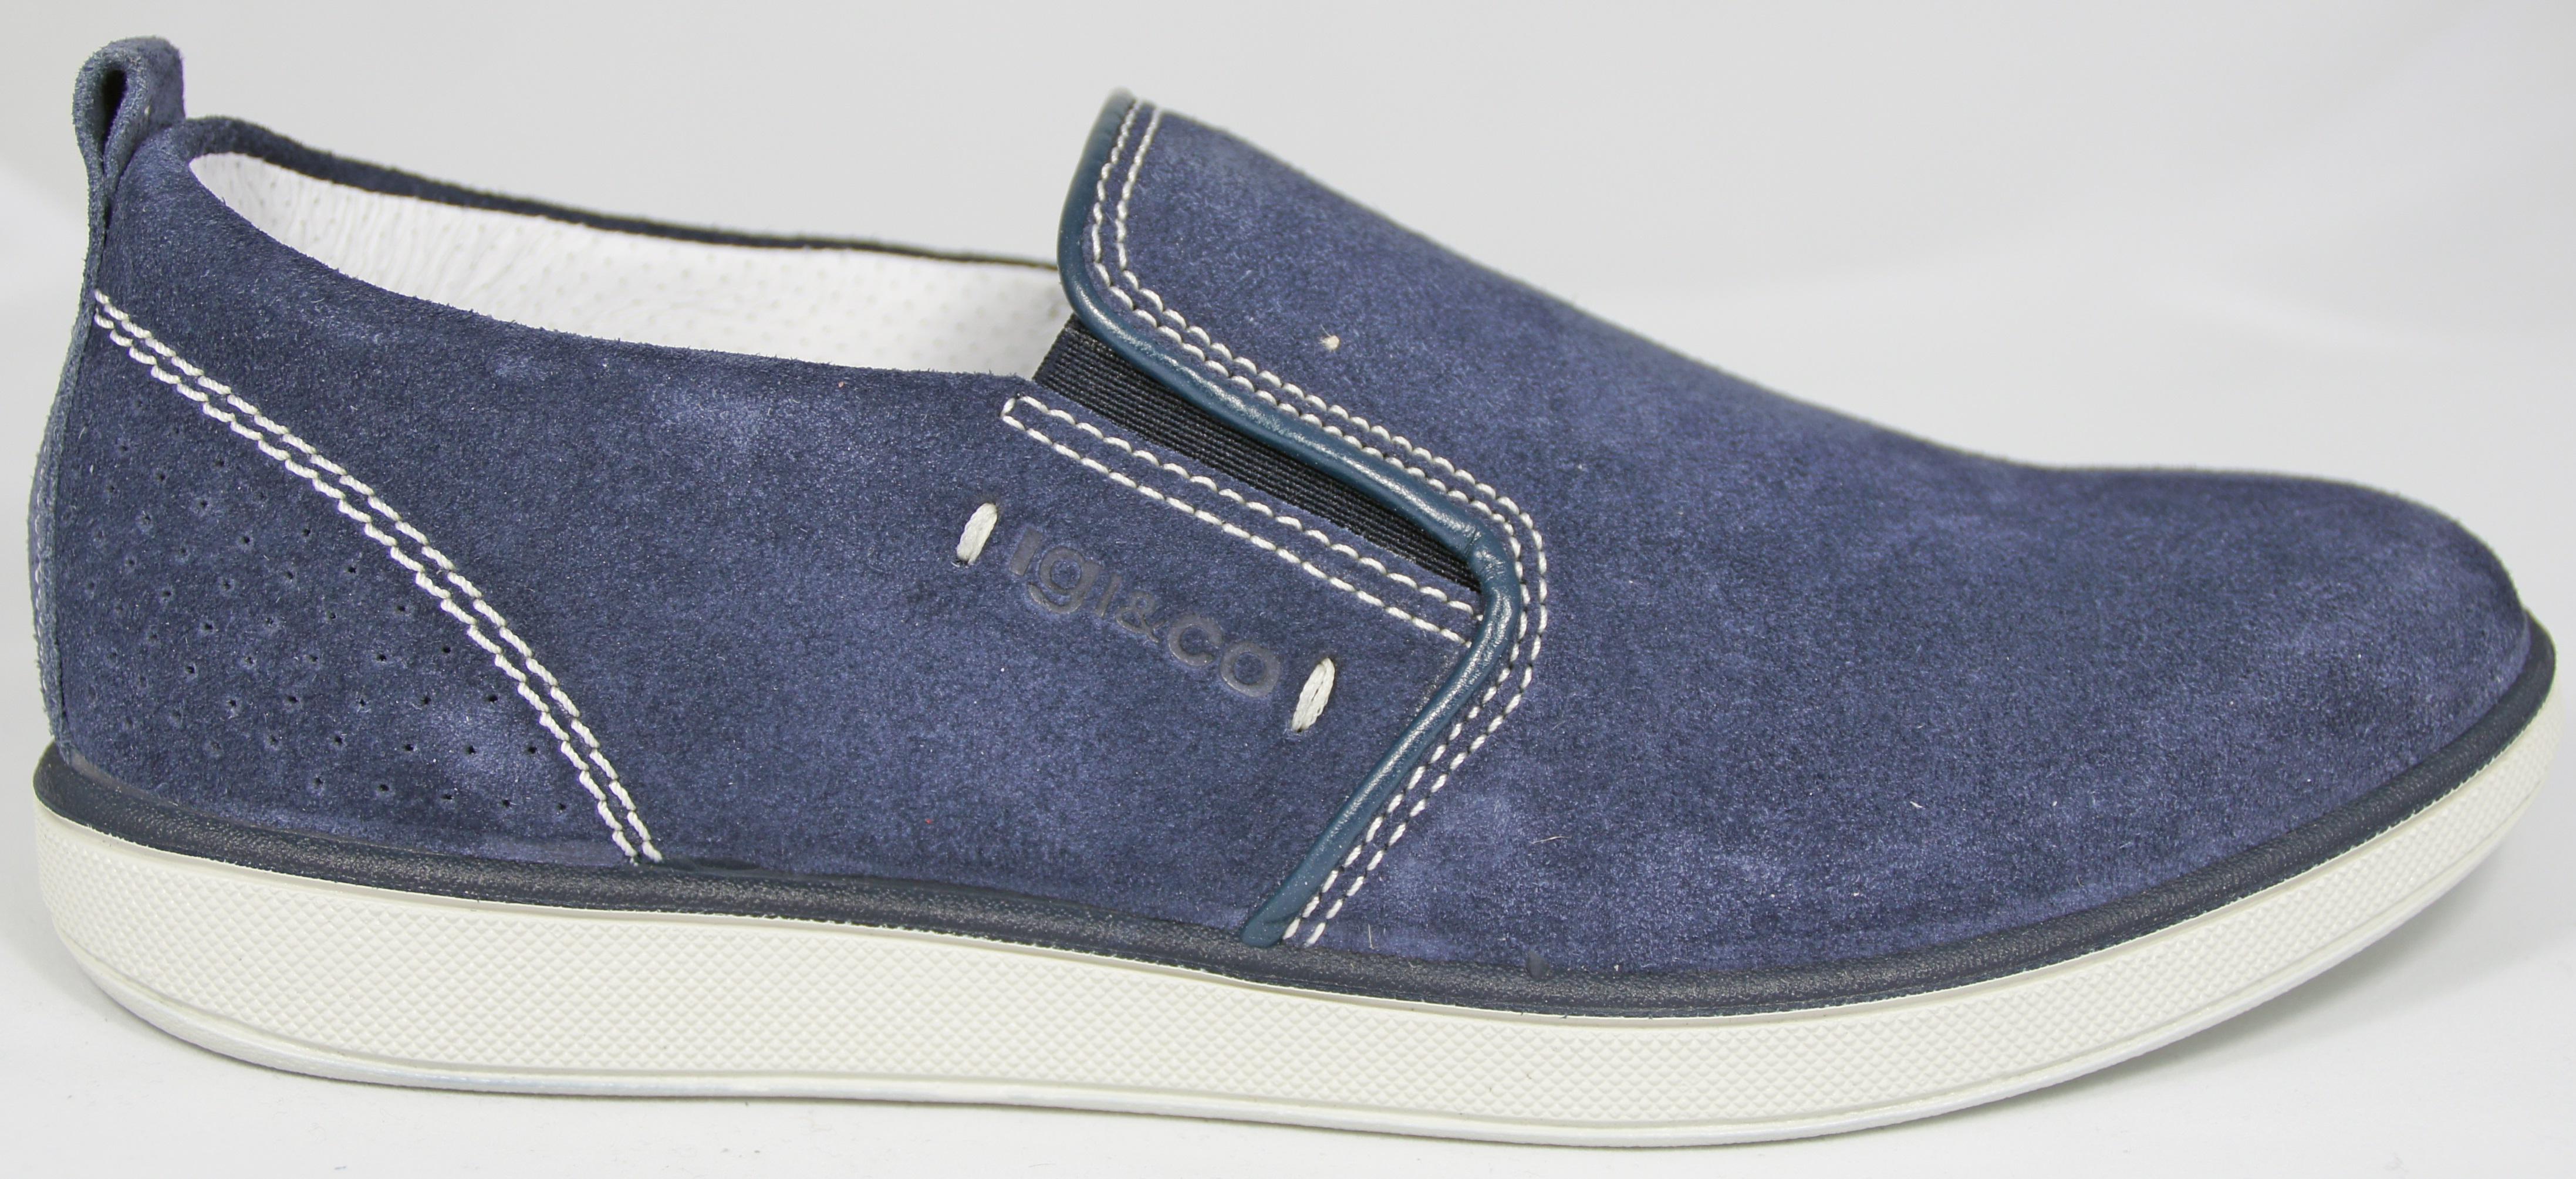 Igi Barone Jeans Special Calzature amp;co X7qzrcX